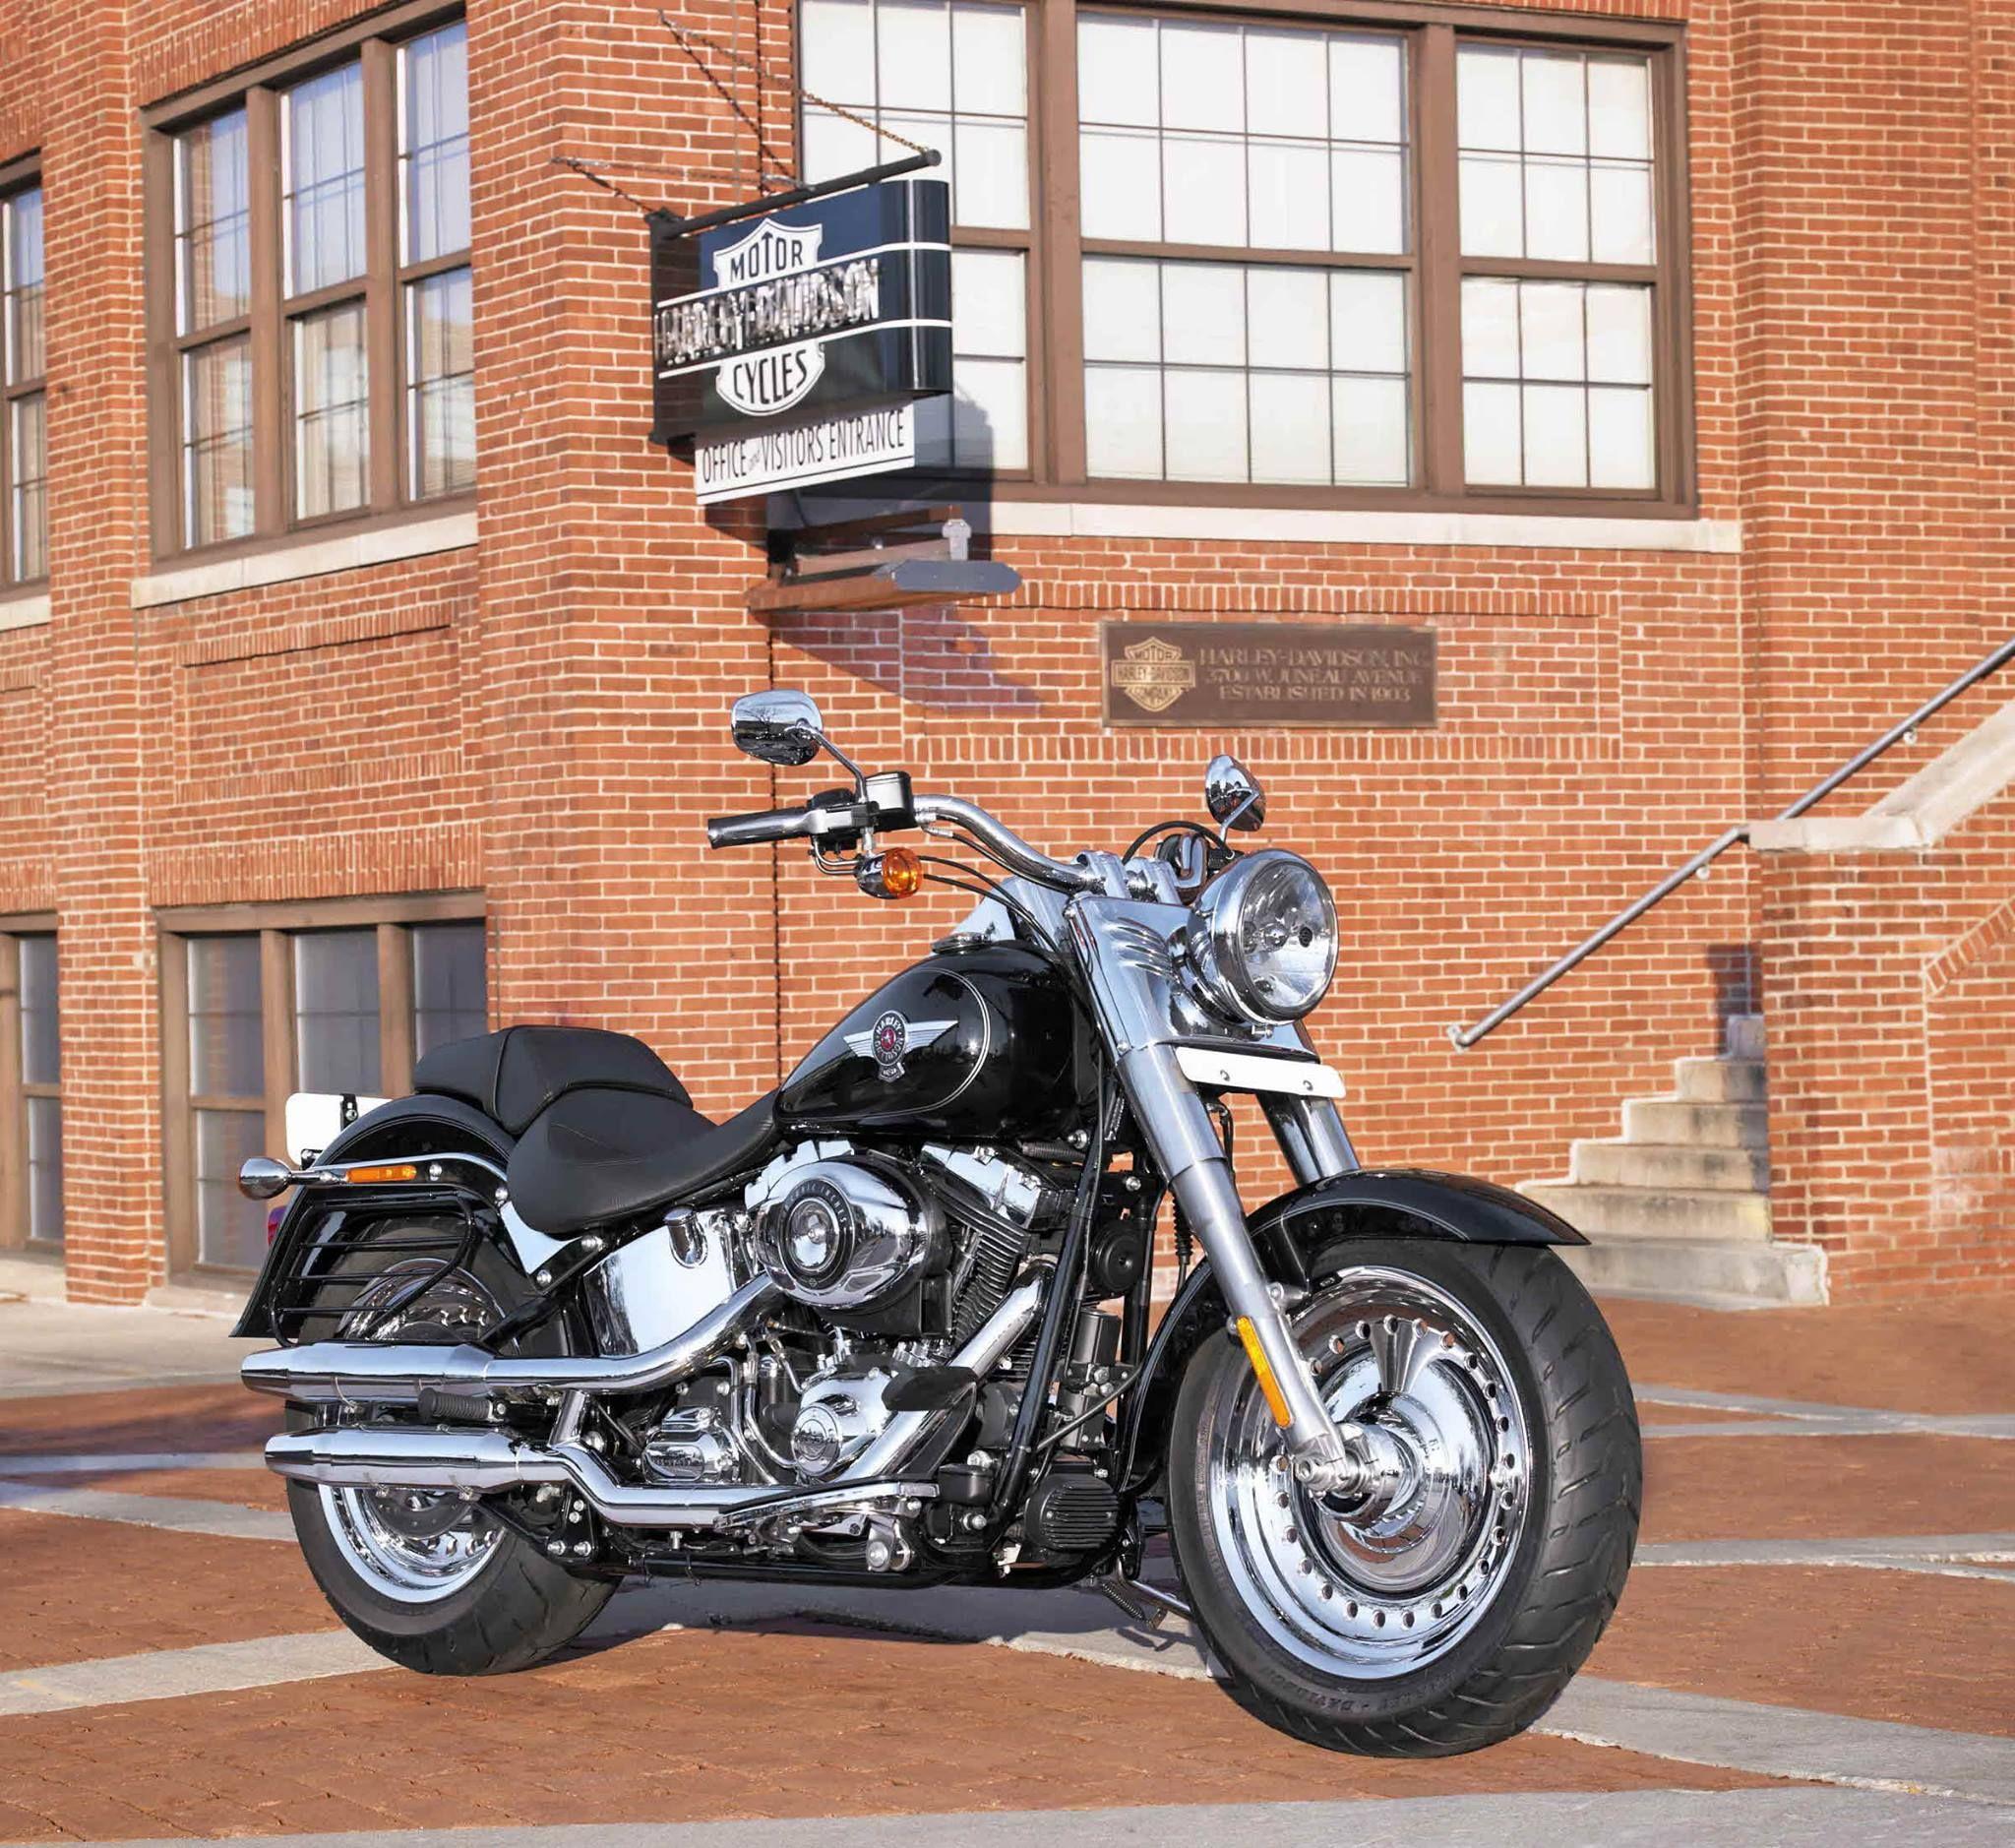 Big boy toys car  Pin by Aki on Bikes  Pinterest  Harley davidson Harley davidson